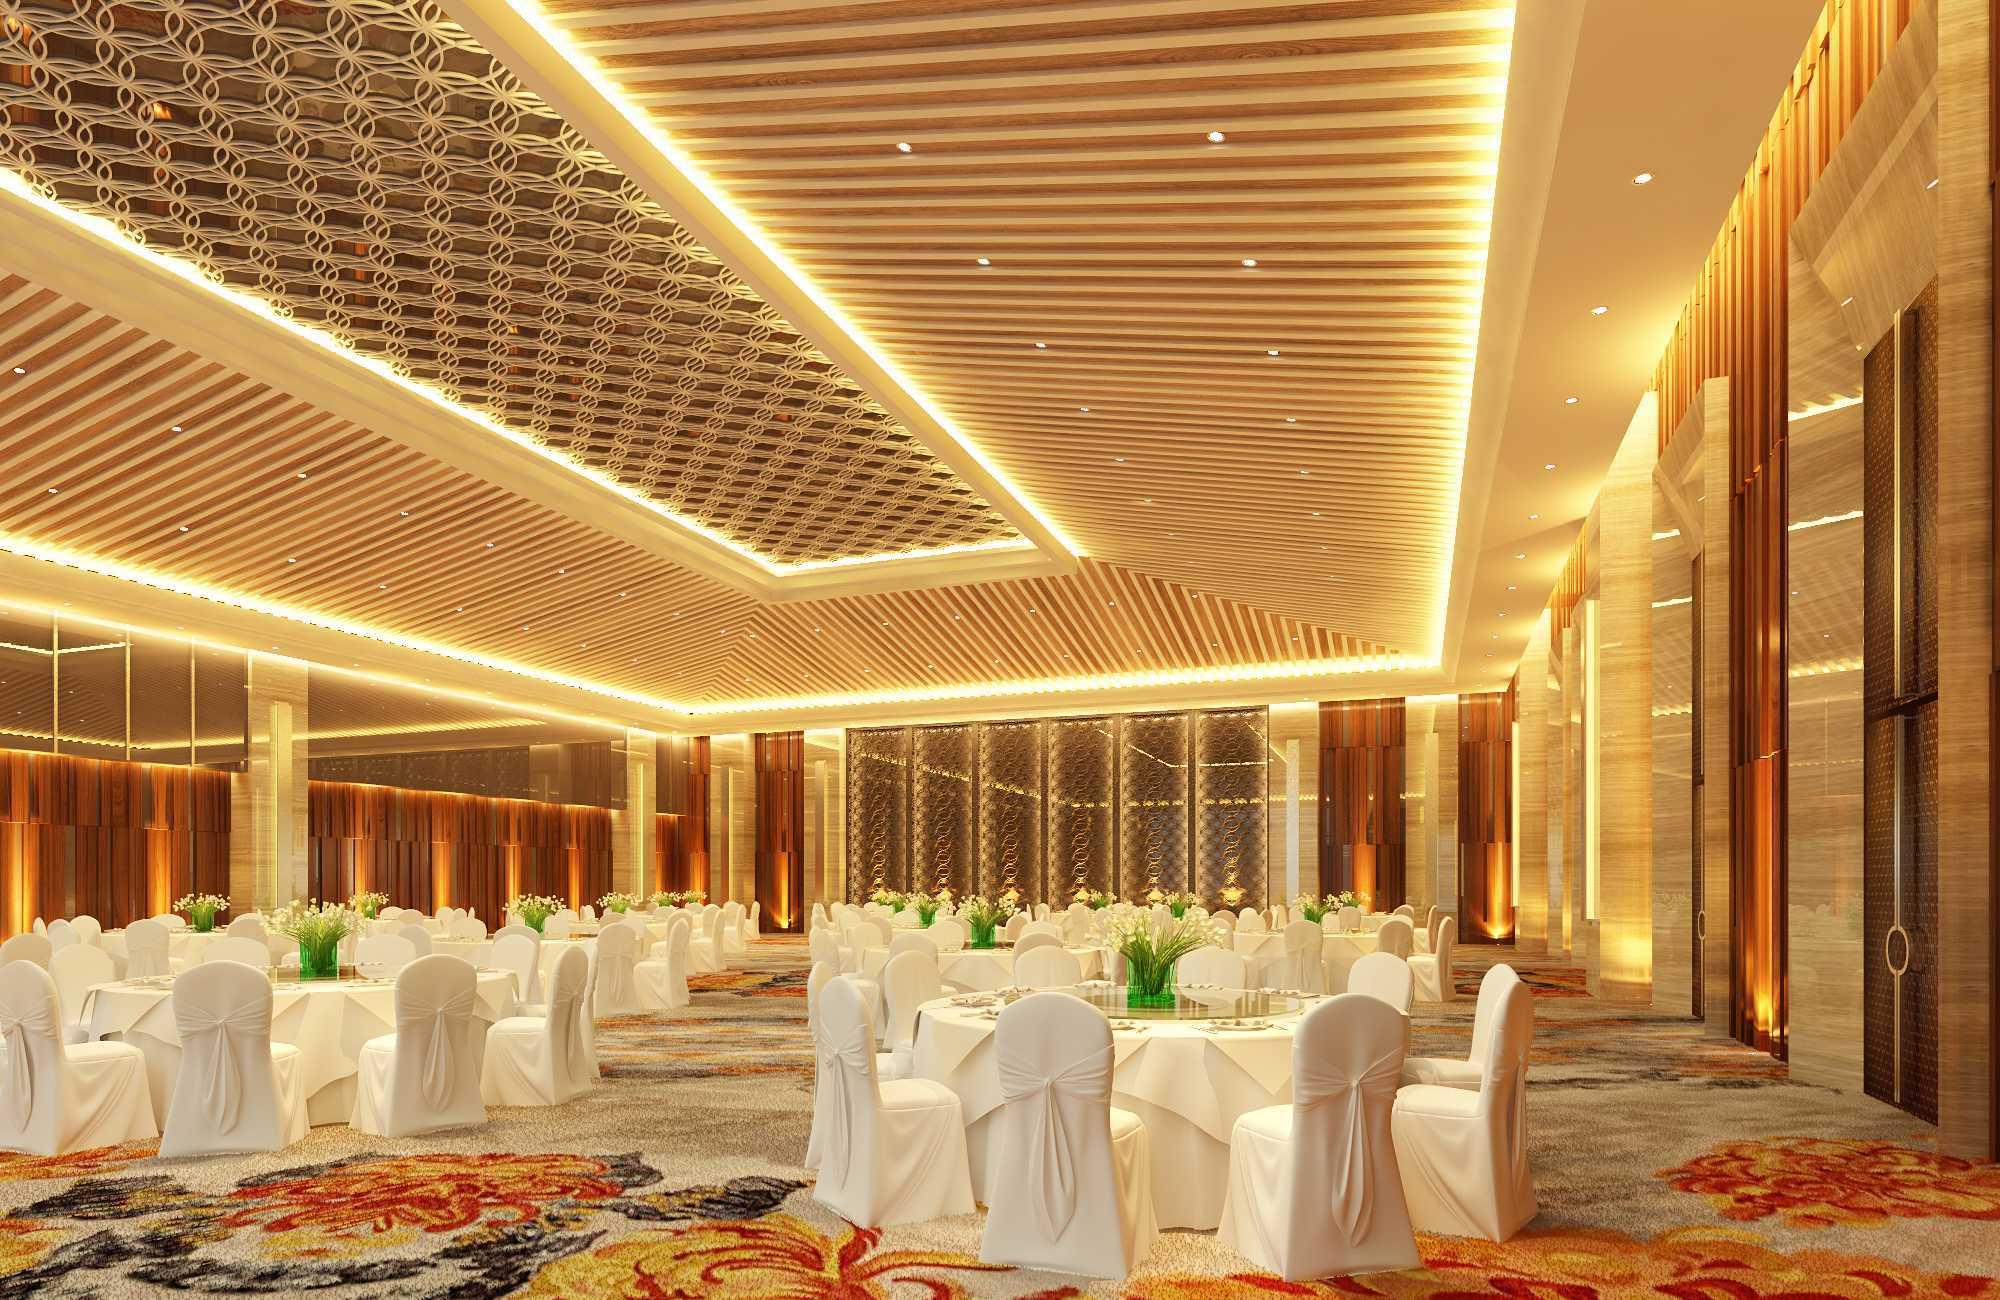 Harold Tutupoly Best Western Premier Batam Batam City, Riau Islands, Indonesia Batam City, Riau Islands, Indonesia 1St-Floor-Ballroom-Alt1 Modern Design Ballroom Area 34519